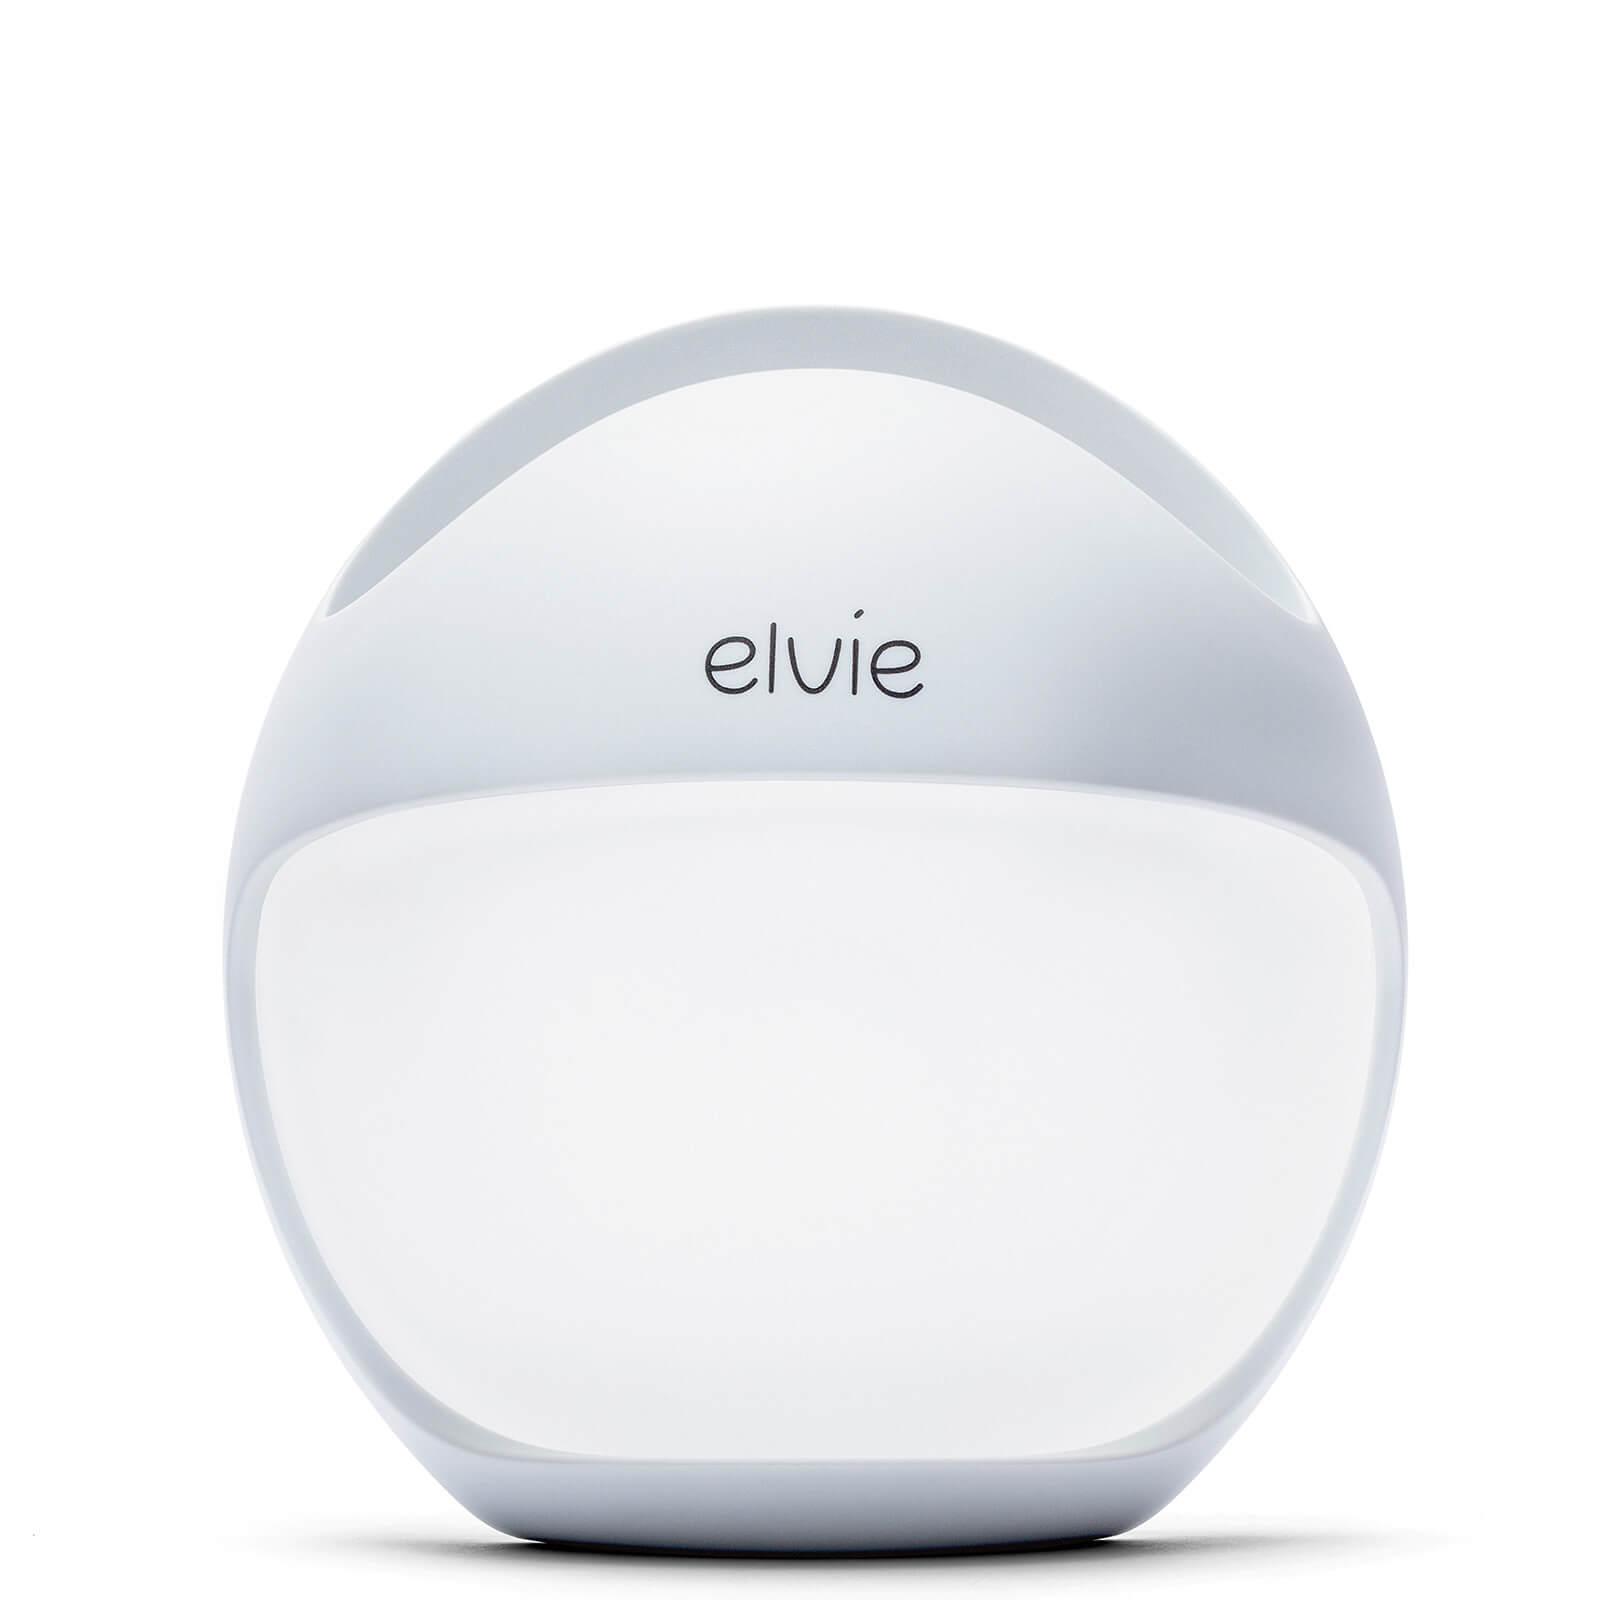 Elvie Curve Silicone Breast Pump